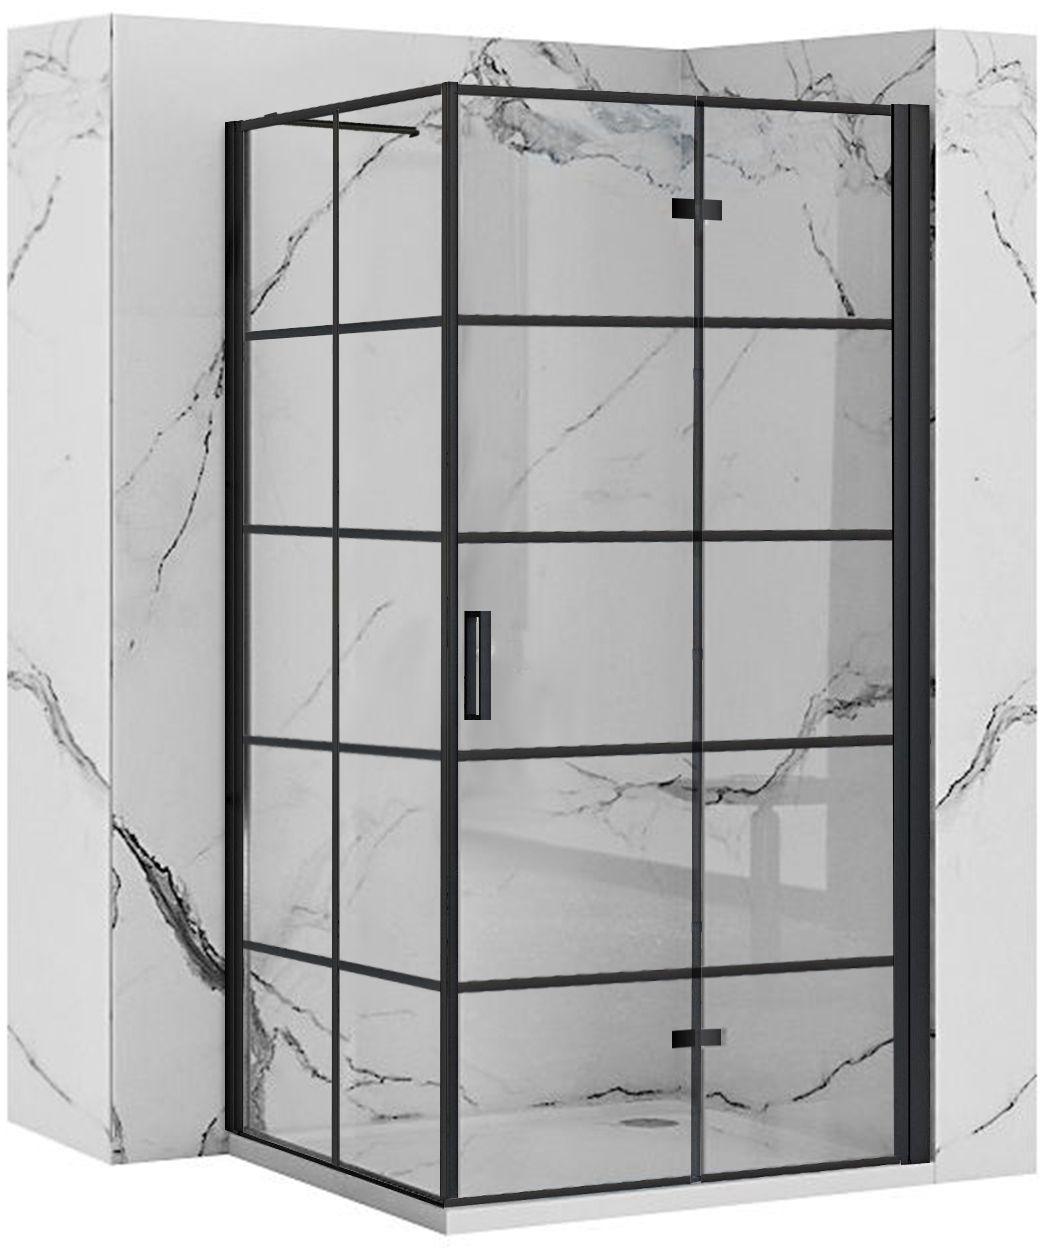 REA/S - Sprchovací kút Moliere dvere / stena 90x100 BLACK MOLDS090100B